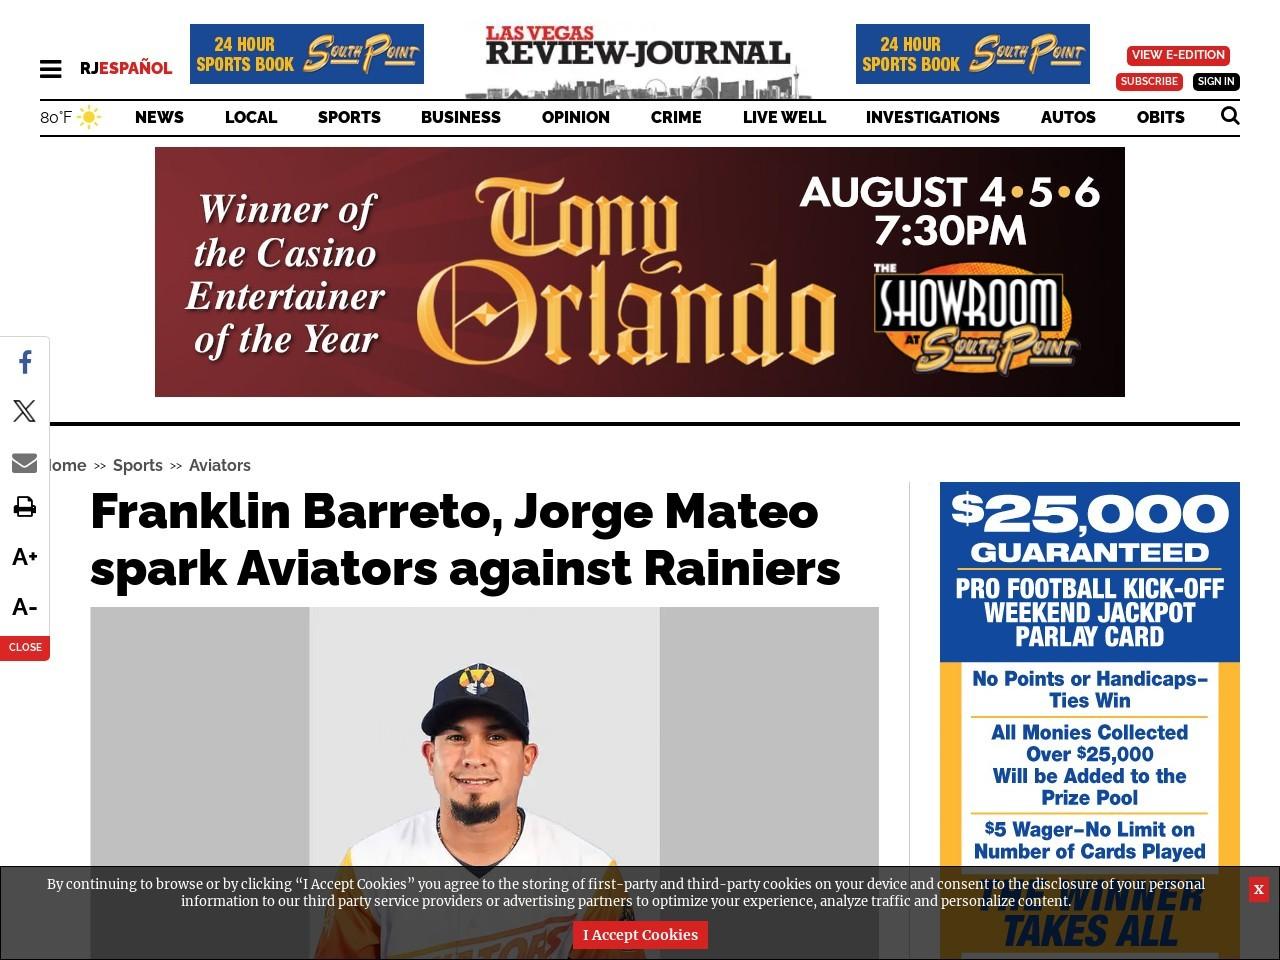 Franklin Barreto, Jorge Mateo spark Aviators against Rainiers